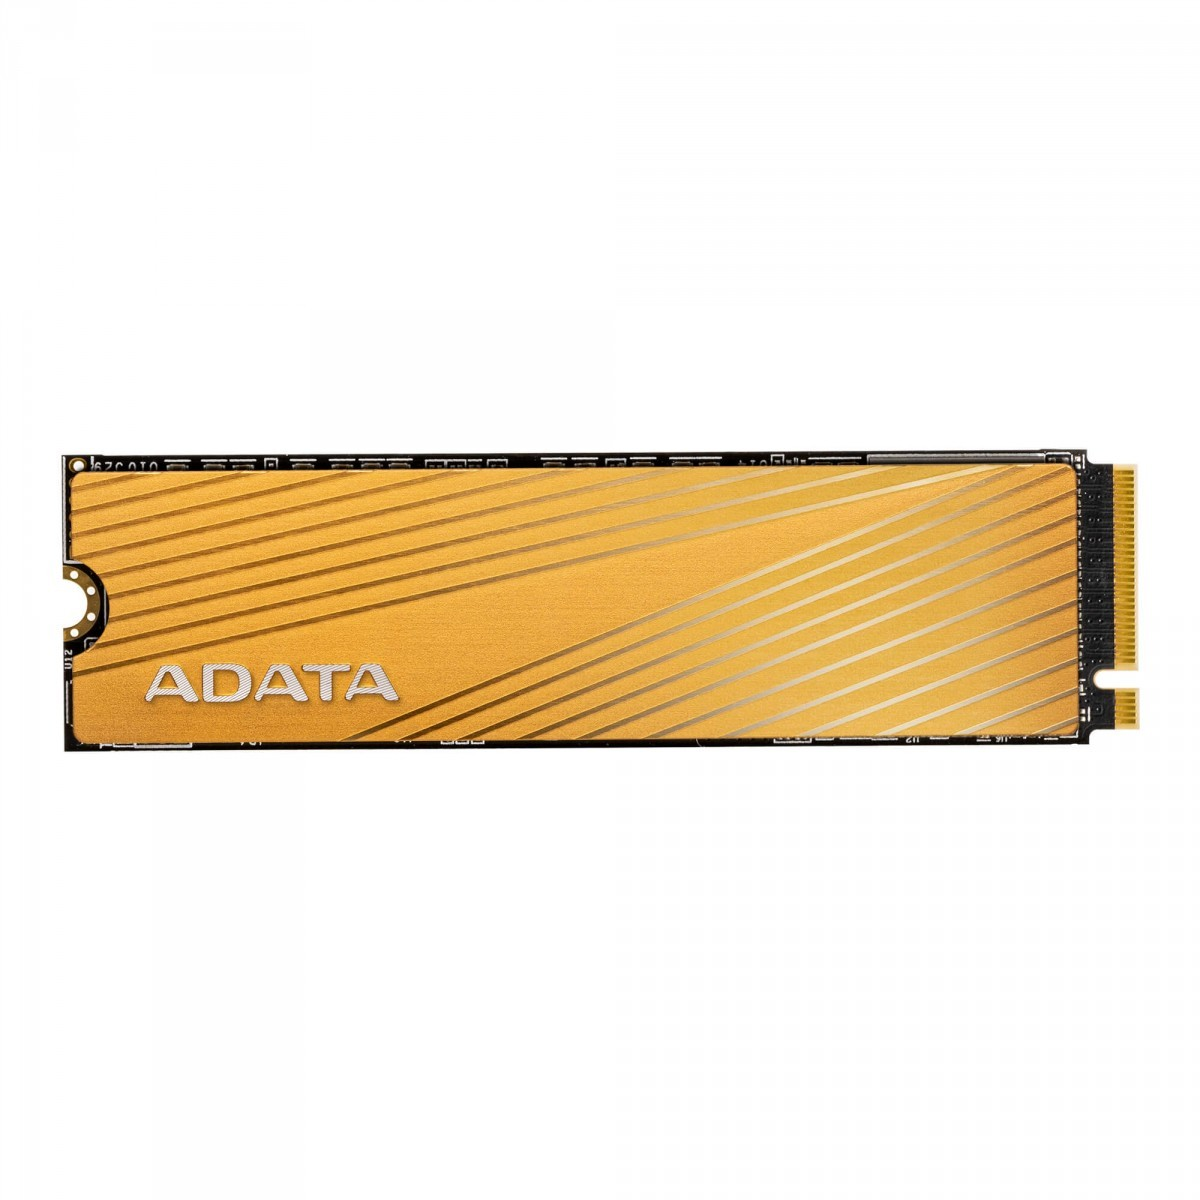 SSD Adata Falcon 256GB, M.2 2280 NVMe, Leitura 3100MBs e Gravação 900MBs, AFALCON-256G-C